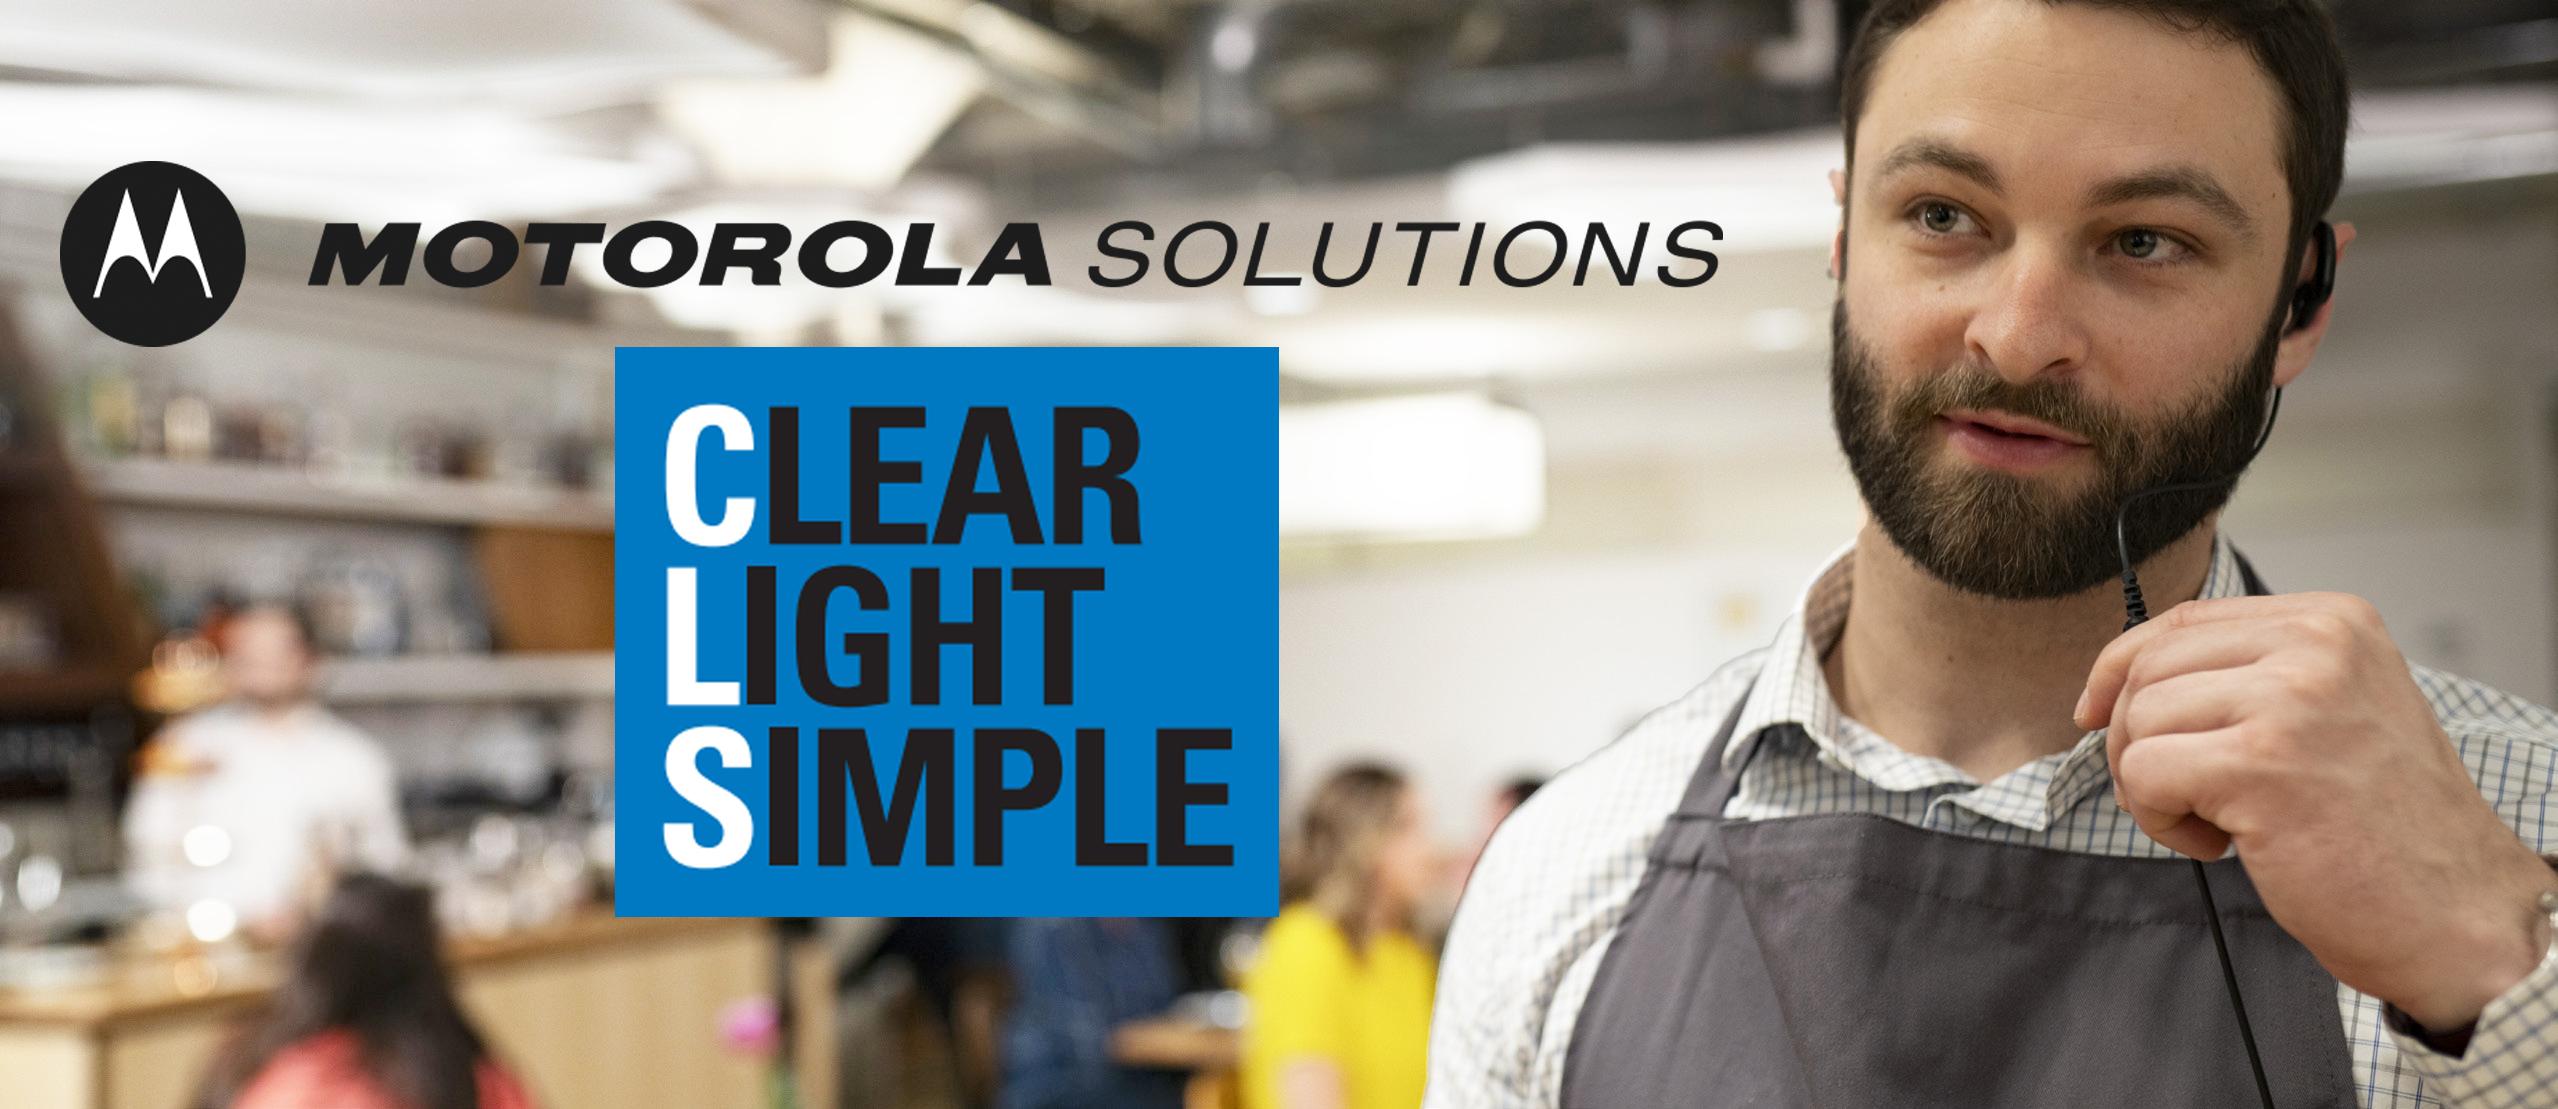 motorola-main-page-cls-clear-light-simple.jpg